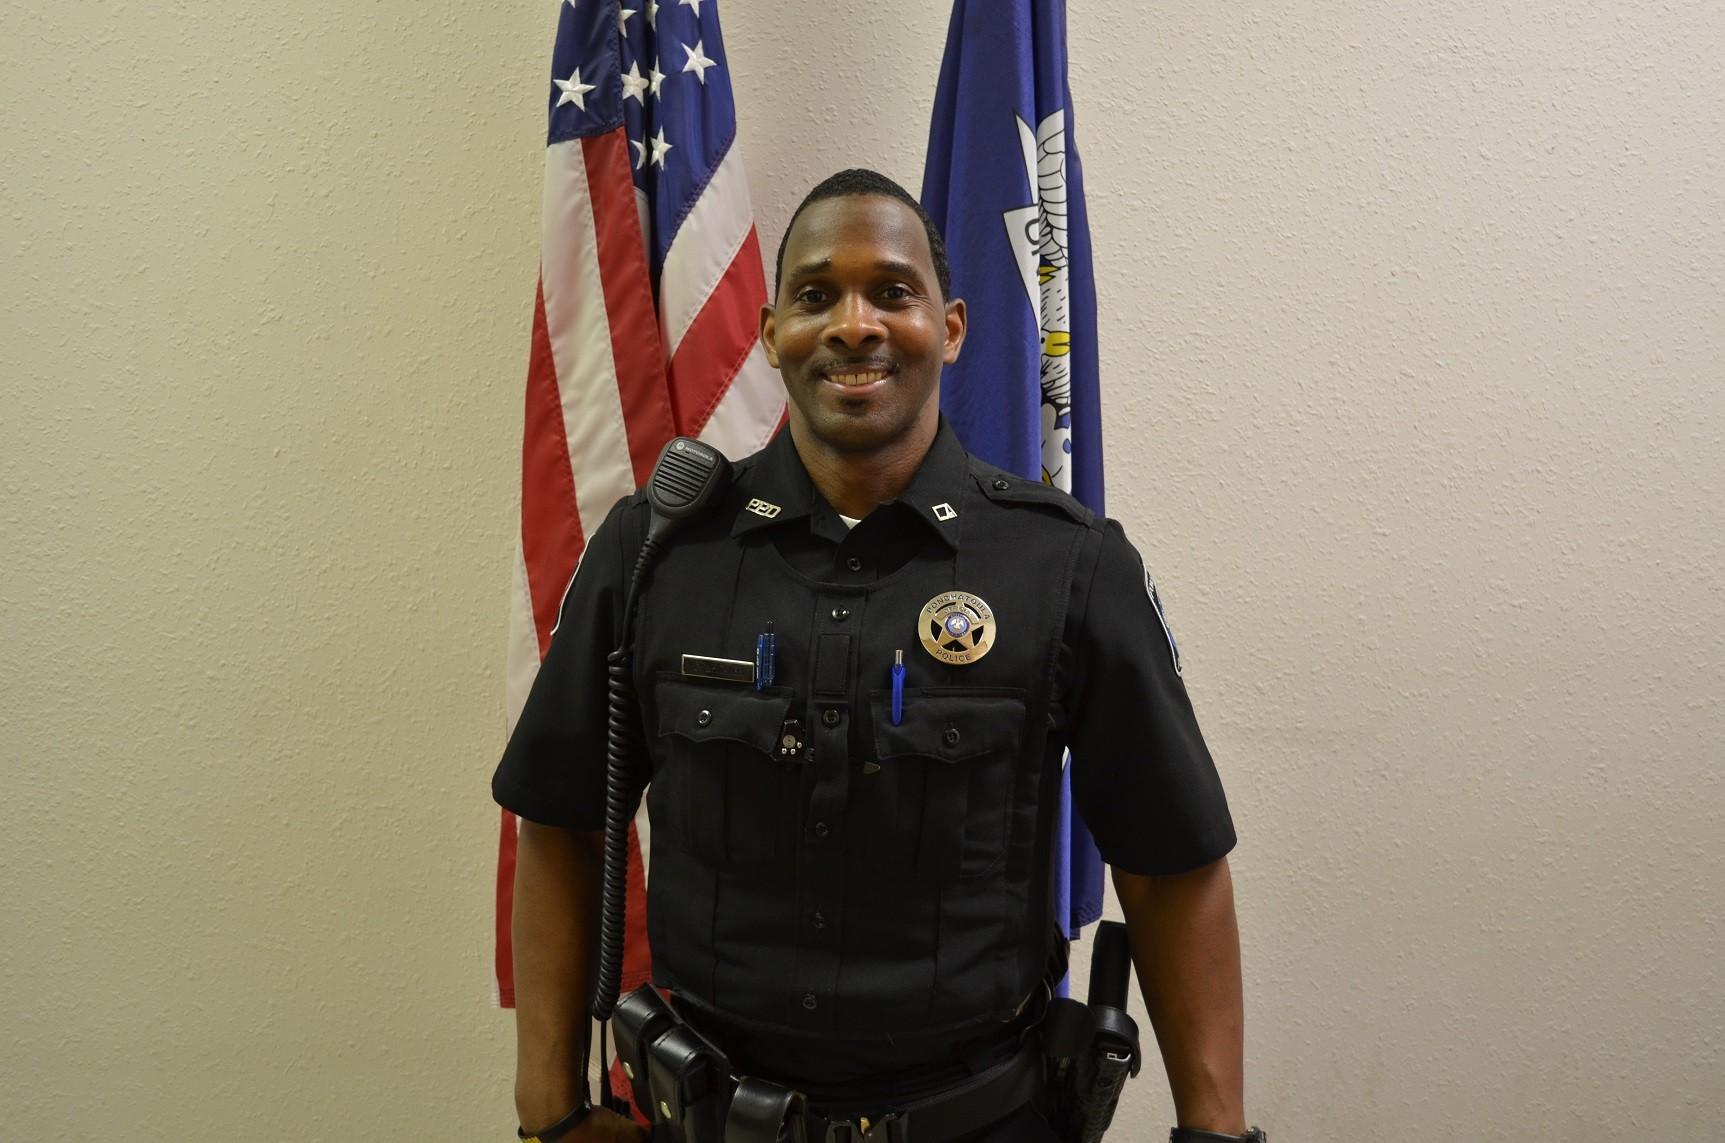 Ofc. Curtis Whitaker